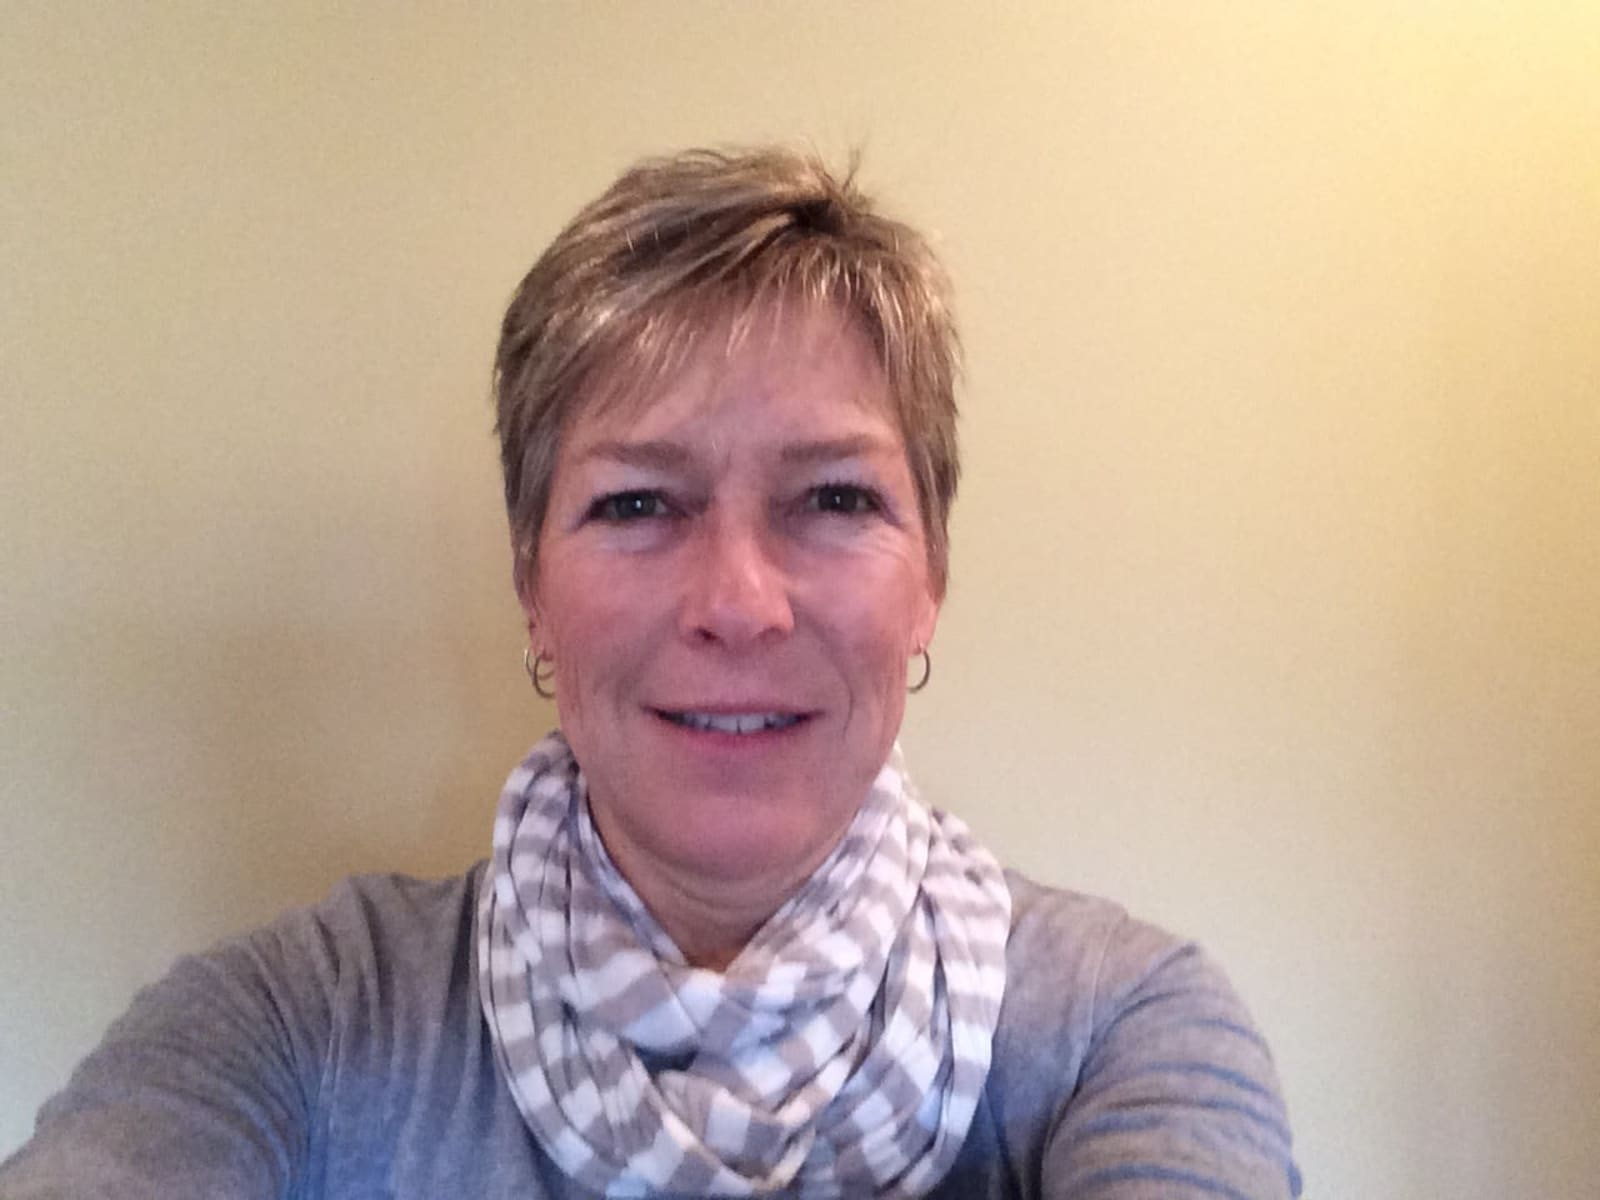 Lisa from Penticton, British Columbia, Canada